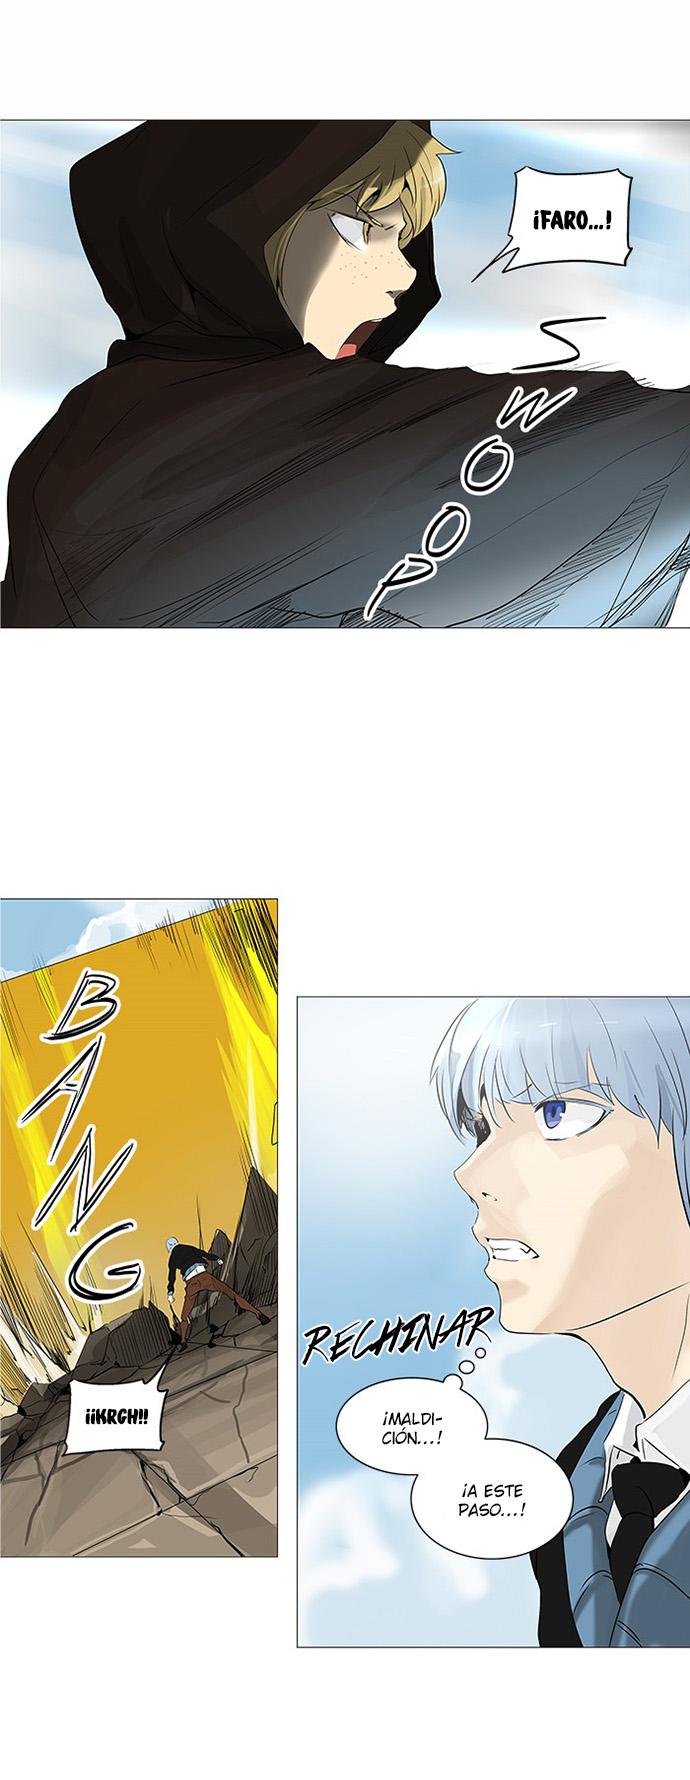 http://c5.ninemanga.com/es_manga/21/149/365457/6802ac2b9aea82a7d56af8b899befea9.jpg Page 6